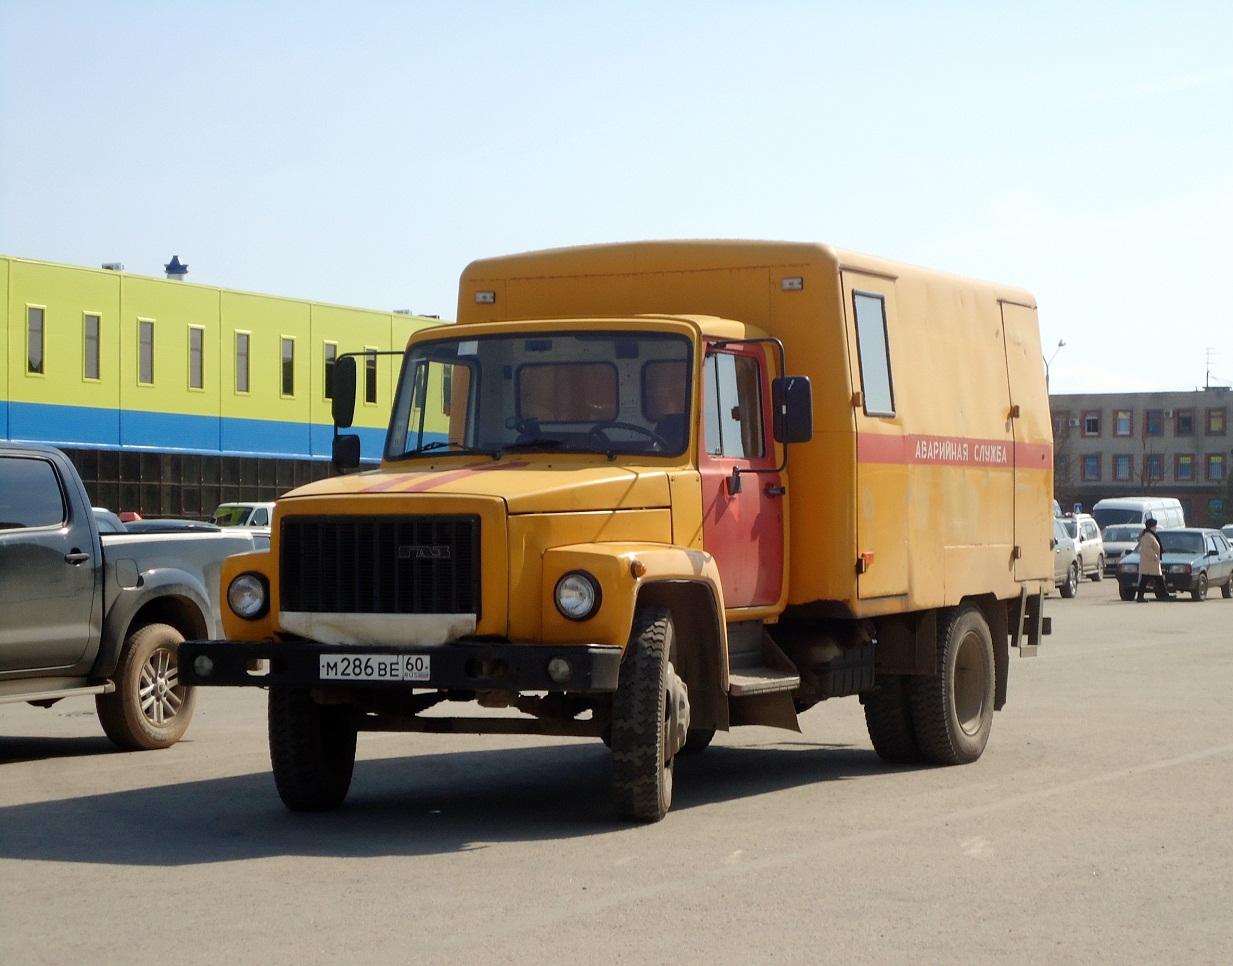 АРТК-М на шасси ГАЗ-3307 #М 286 ВЕ 60. Псков, улица Труда